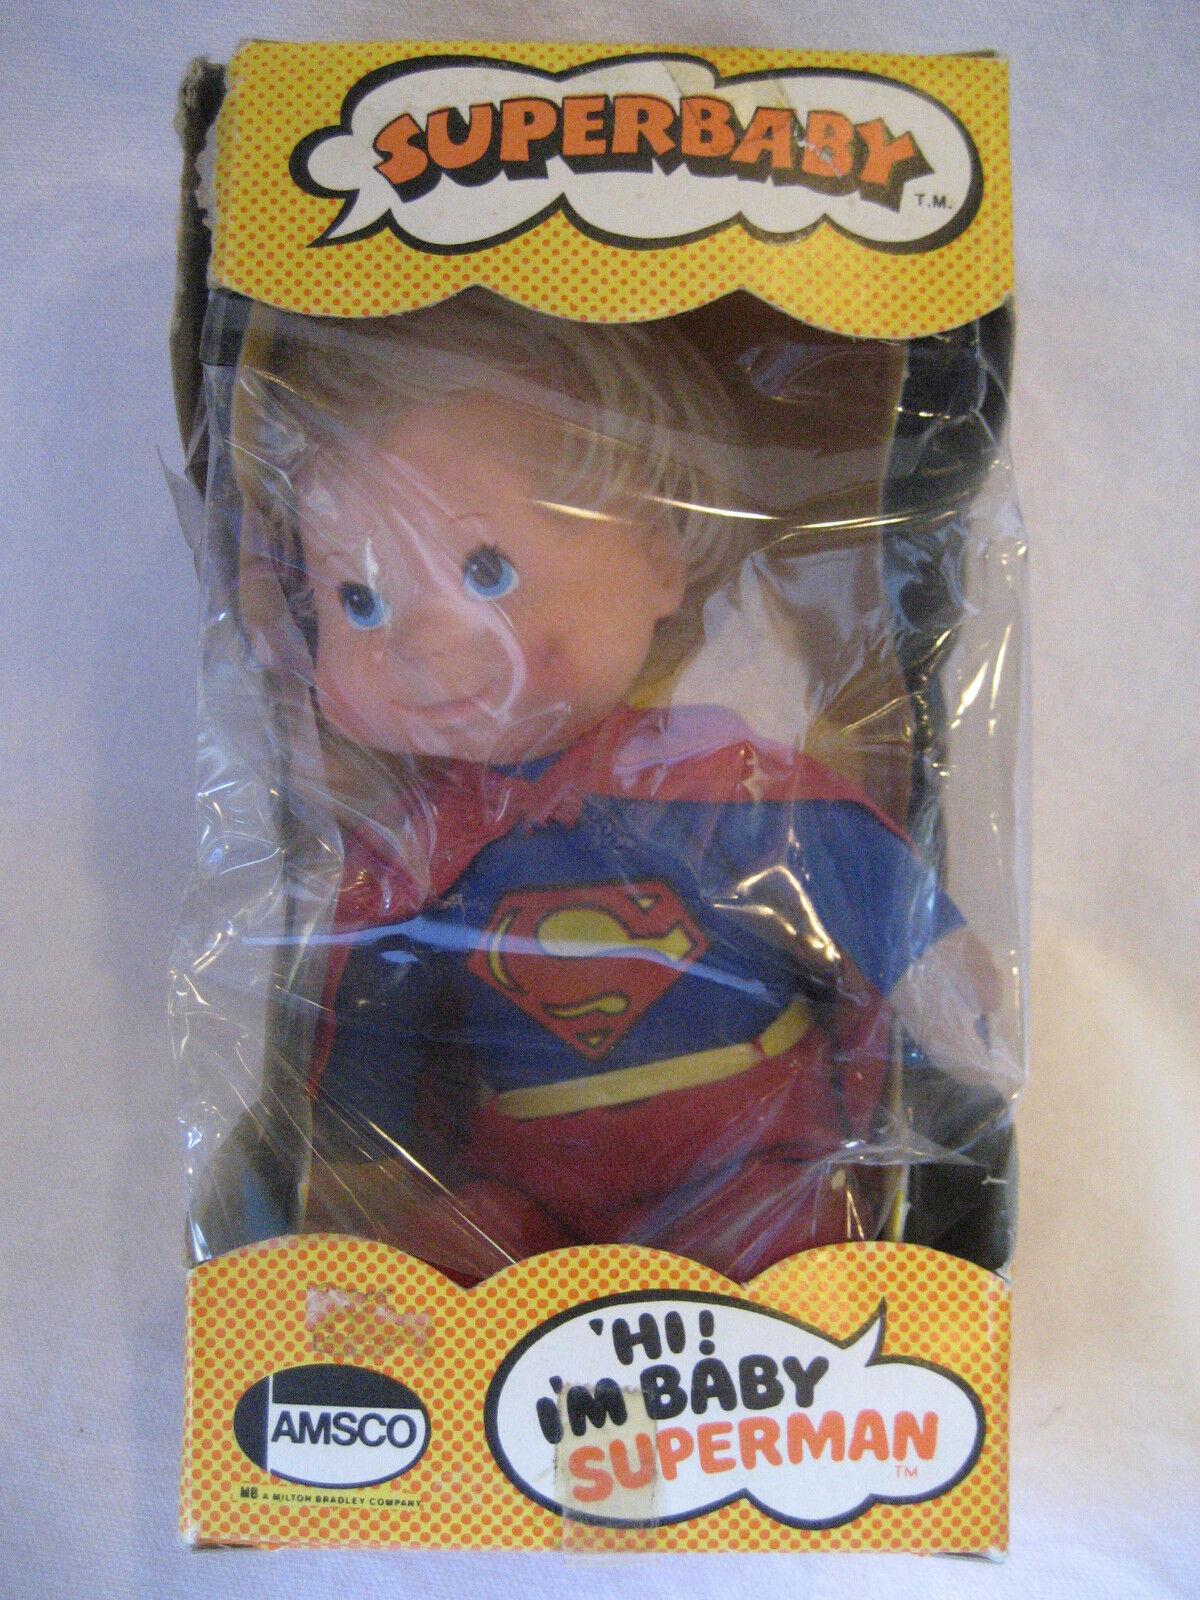 MIB 1976 vintage SUPERMAN Super Baby plush doll figure Amsco Super Babies DC